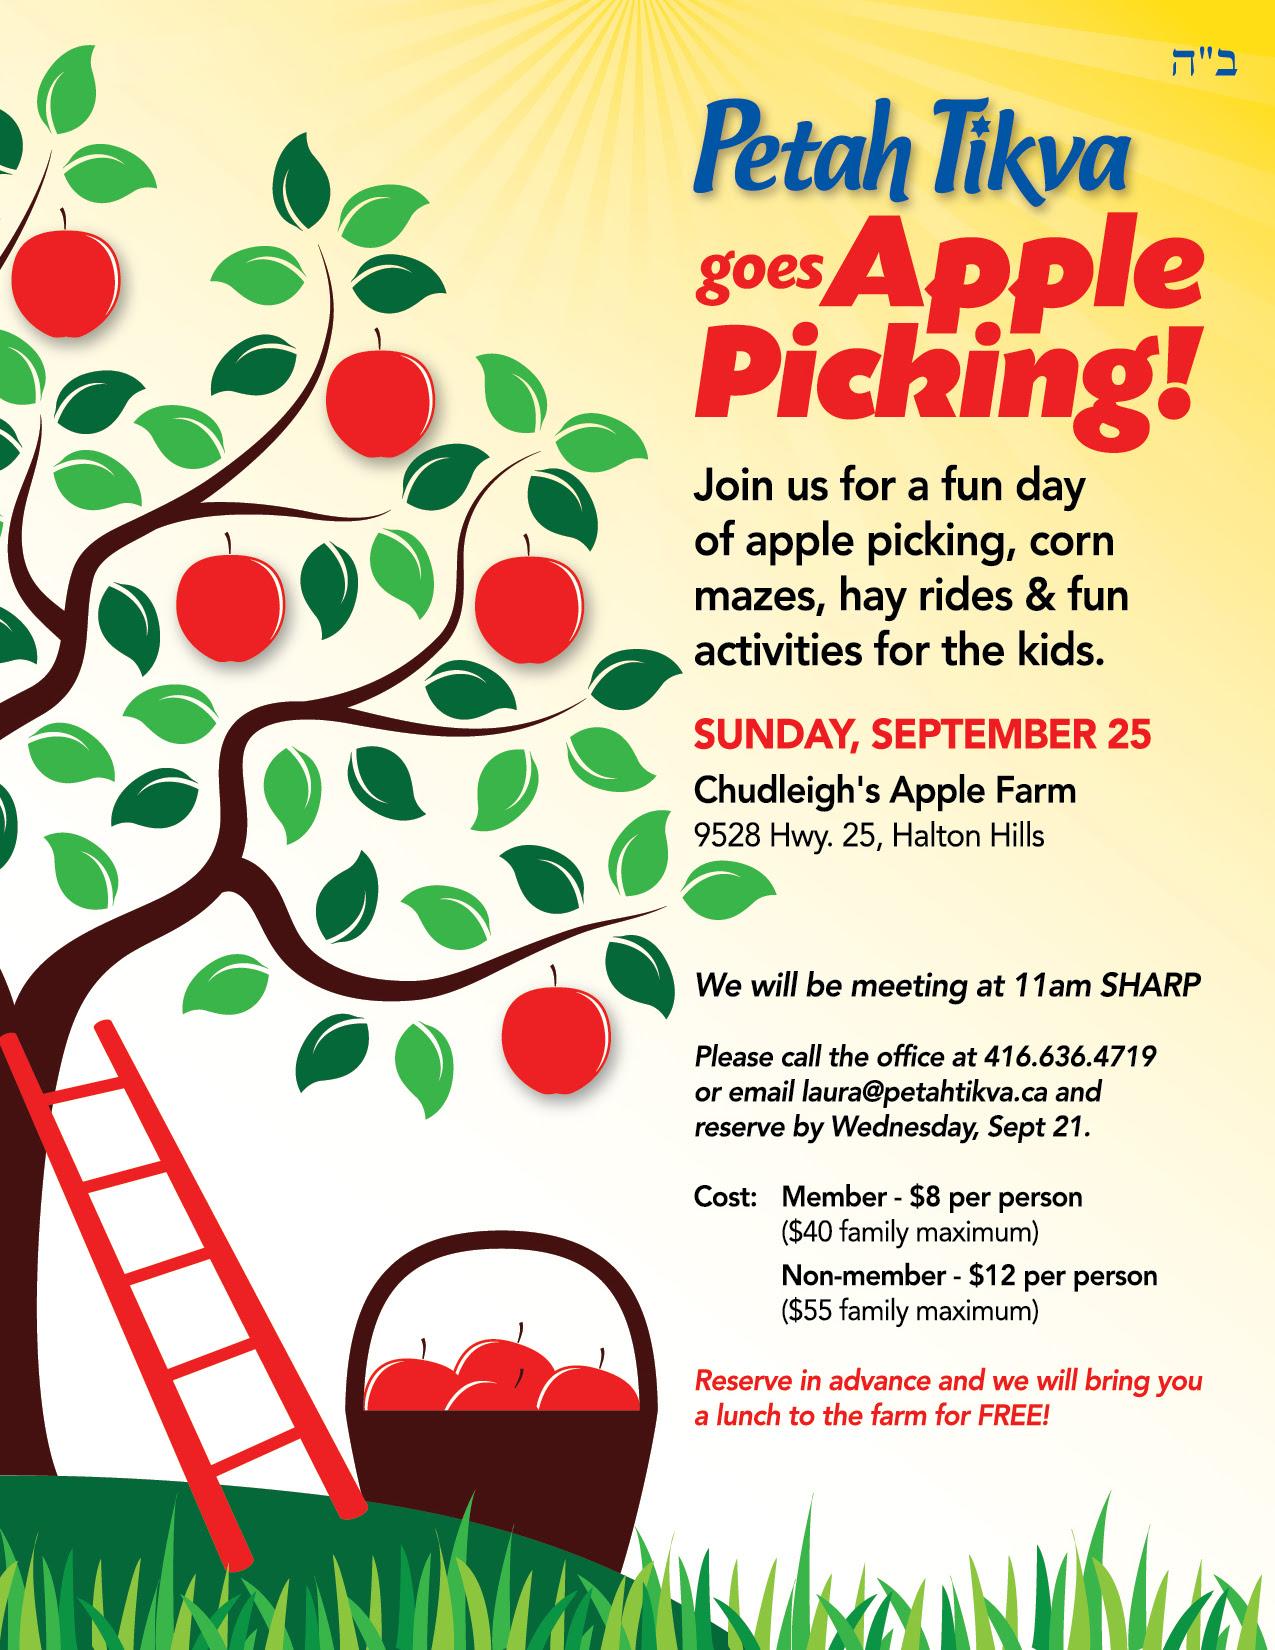 Petah Tikva goes Apple Picking